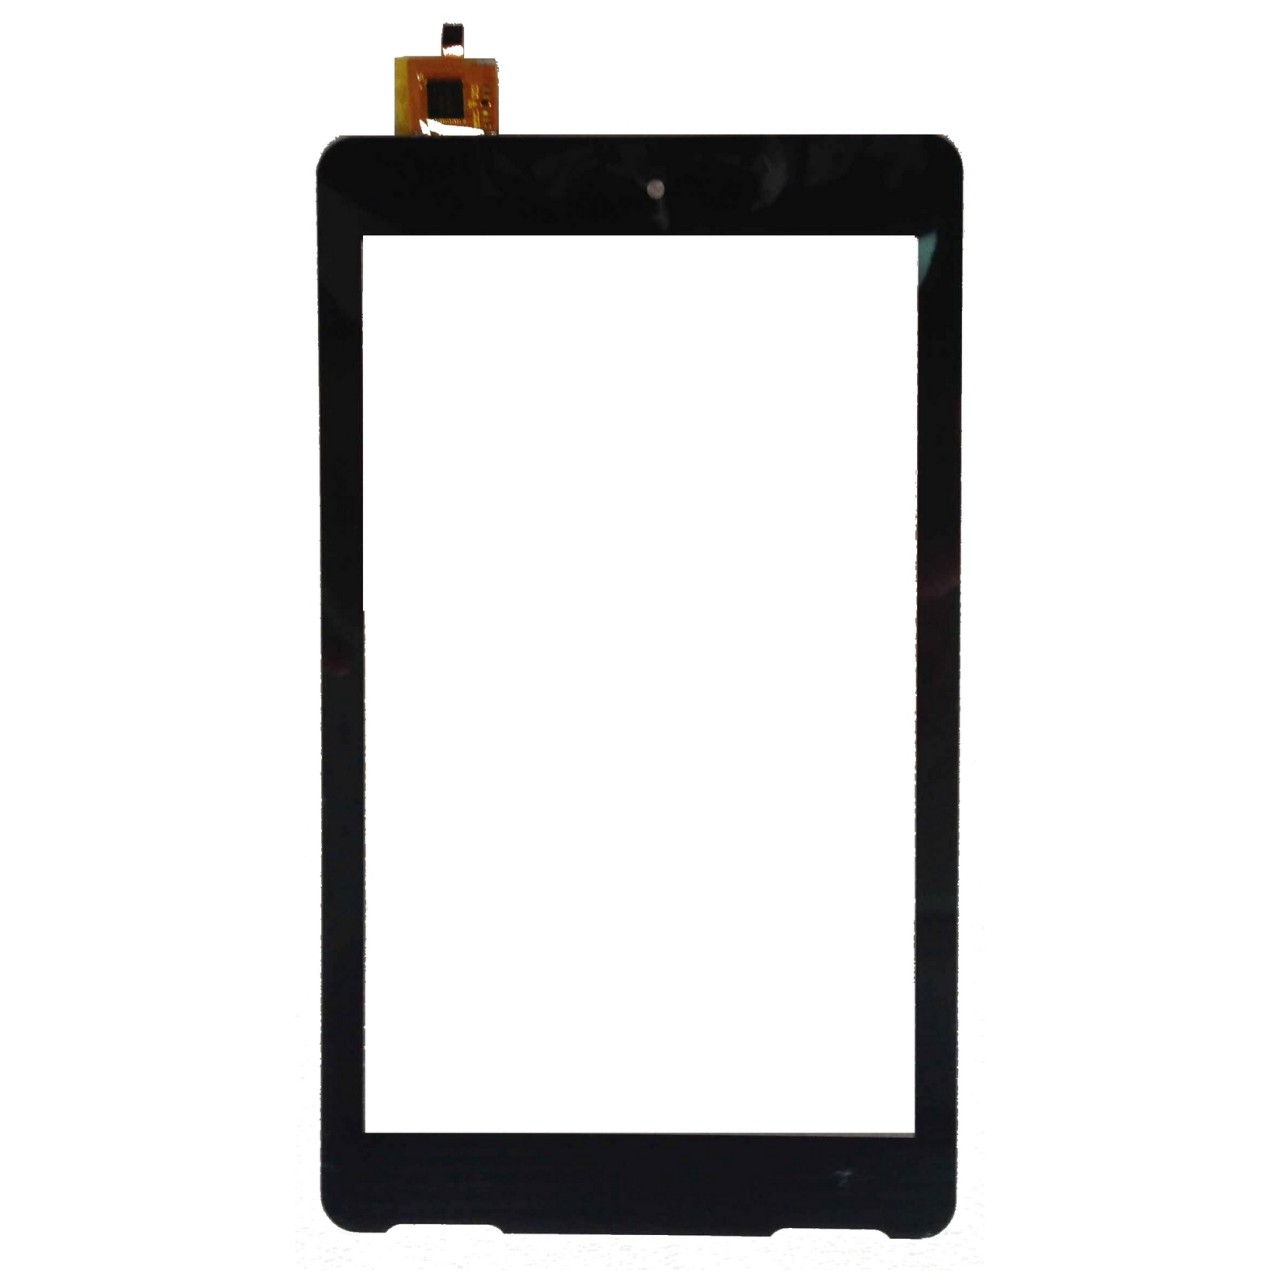 Touchscreen Digitizer Evolio X7 Geam Sticla Tableta imagine powerlaptop.ro 2021